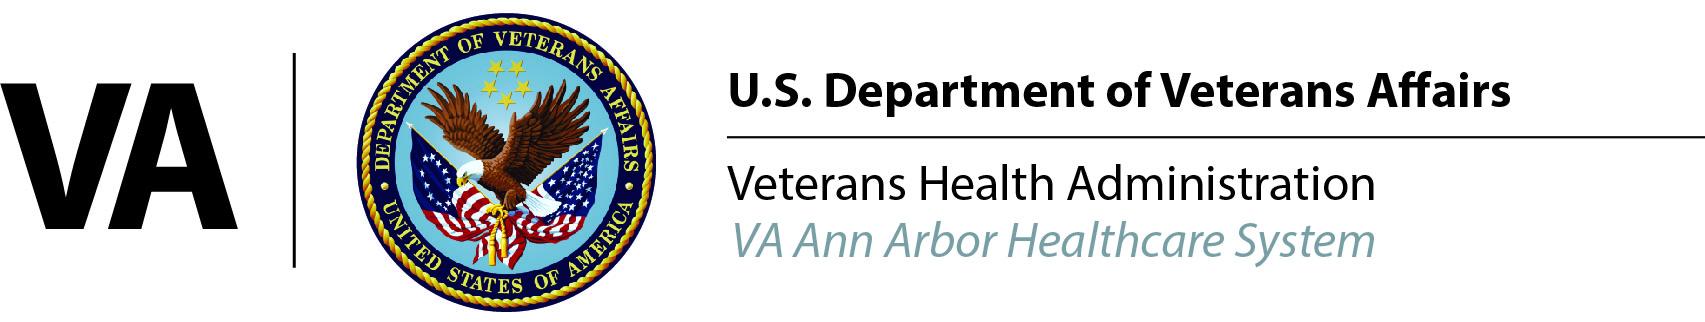 VA Health Administration Logo